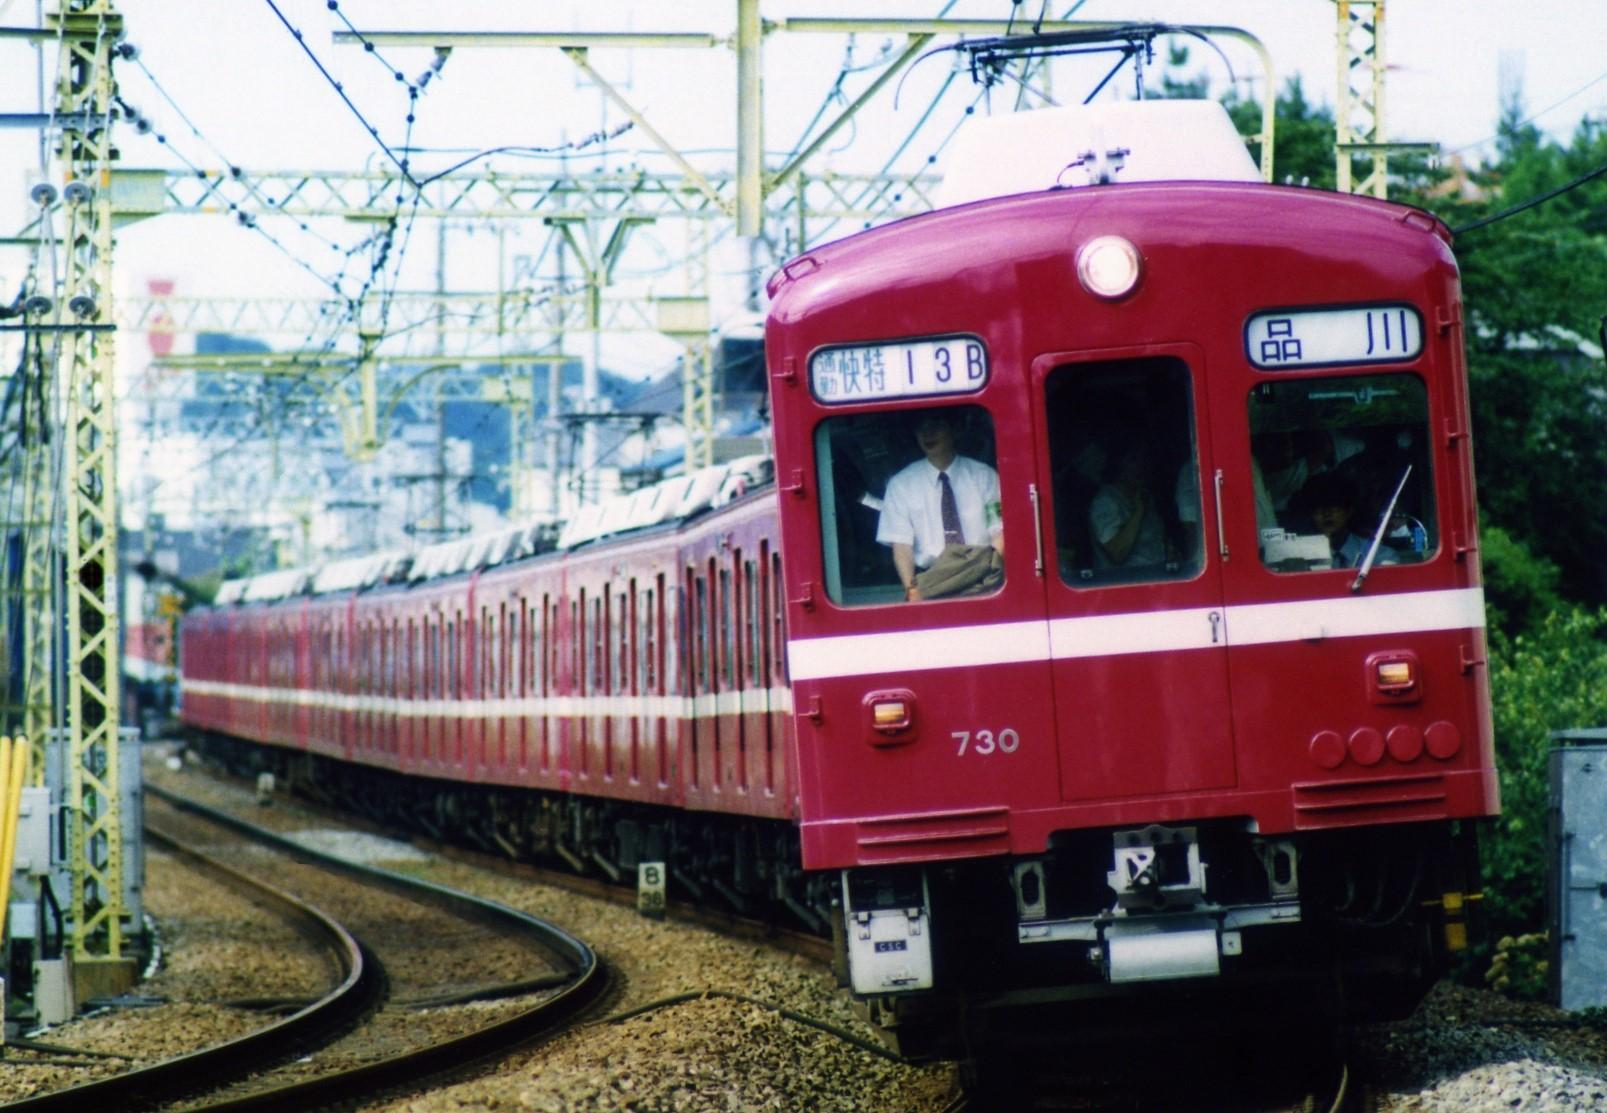 713B (2)